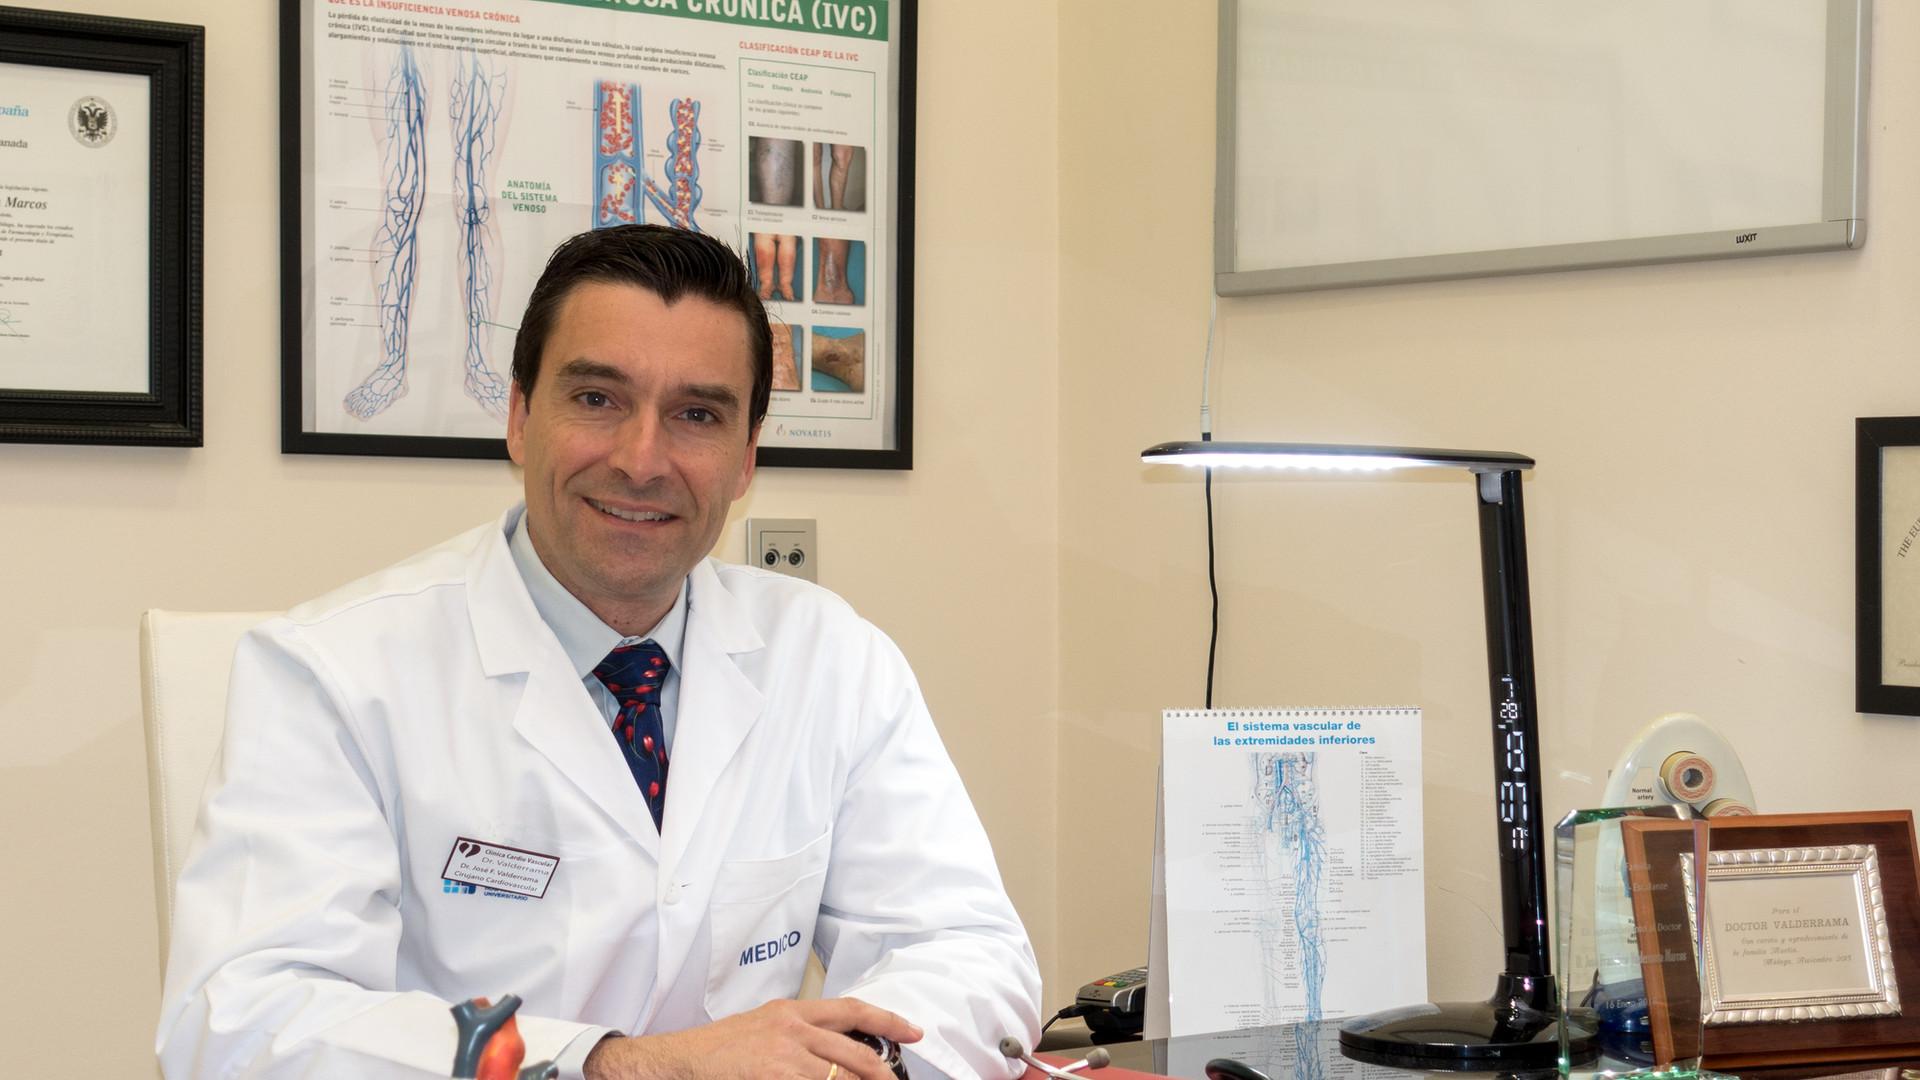 Dr Valderrama_Despacho-2.jpg